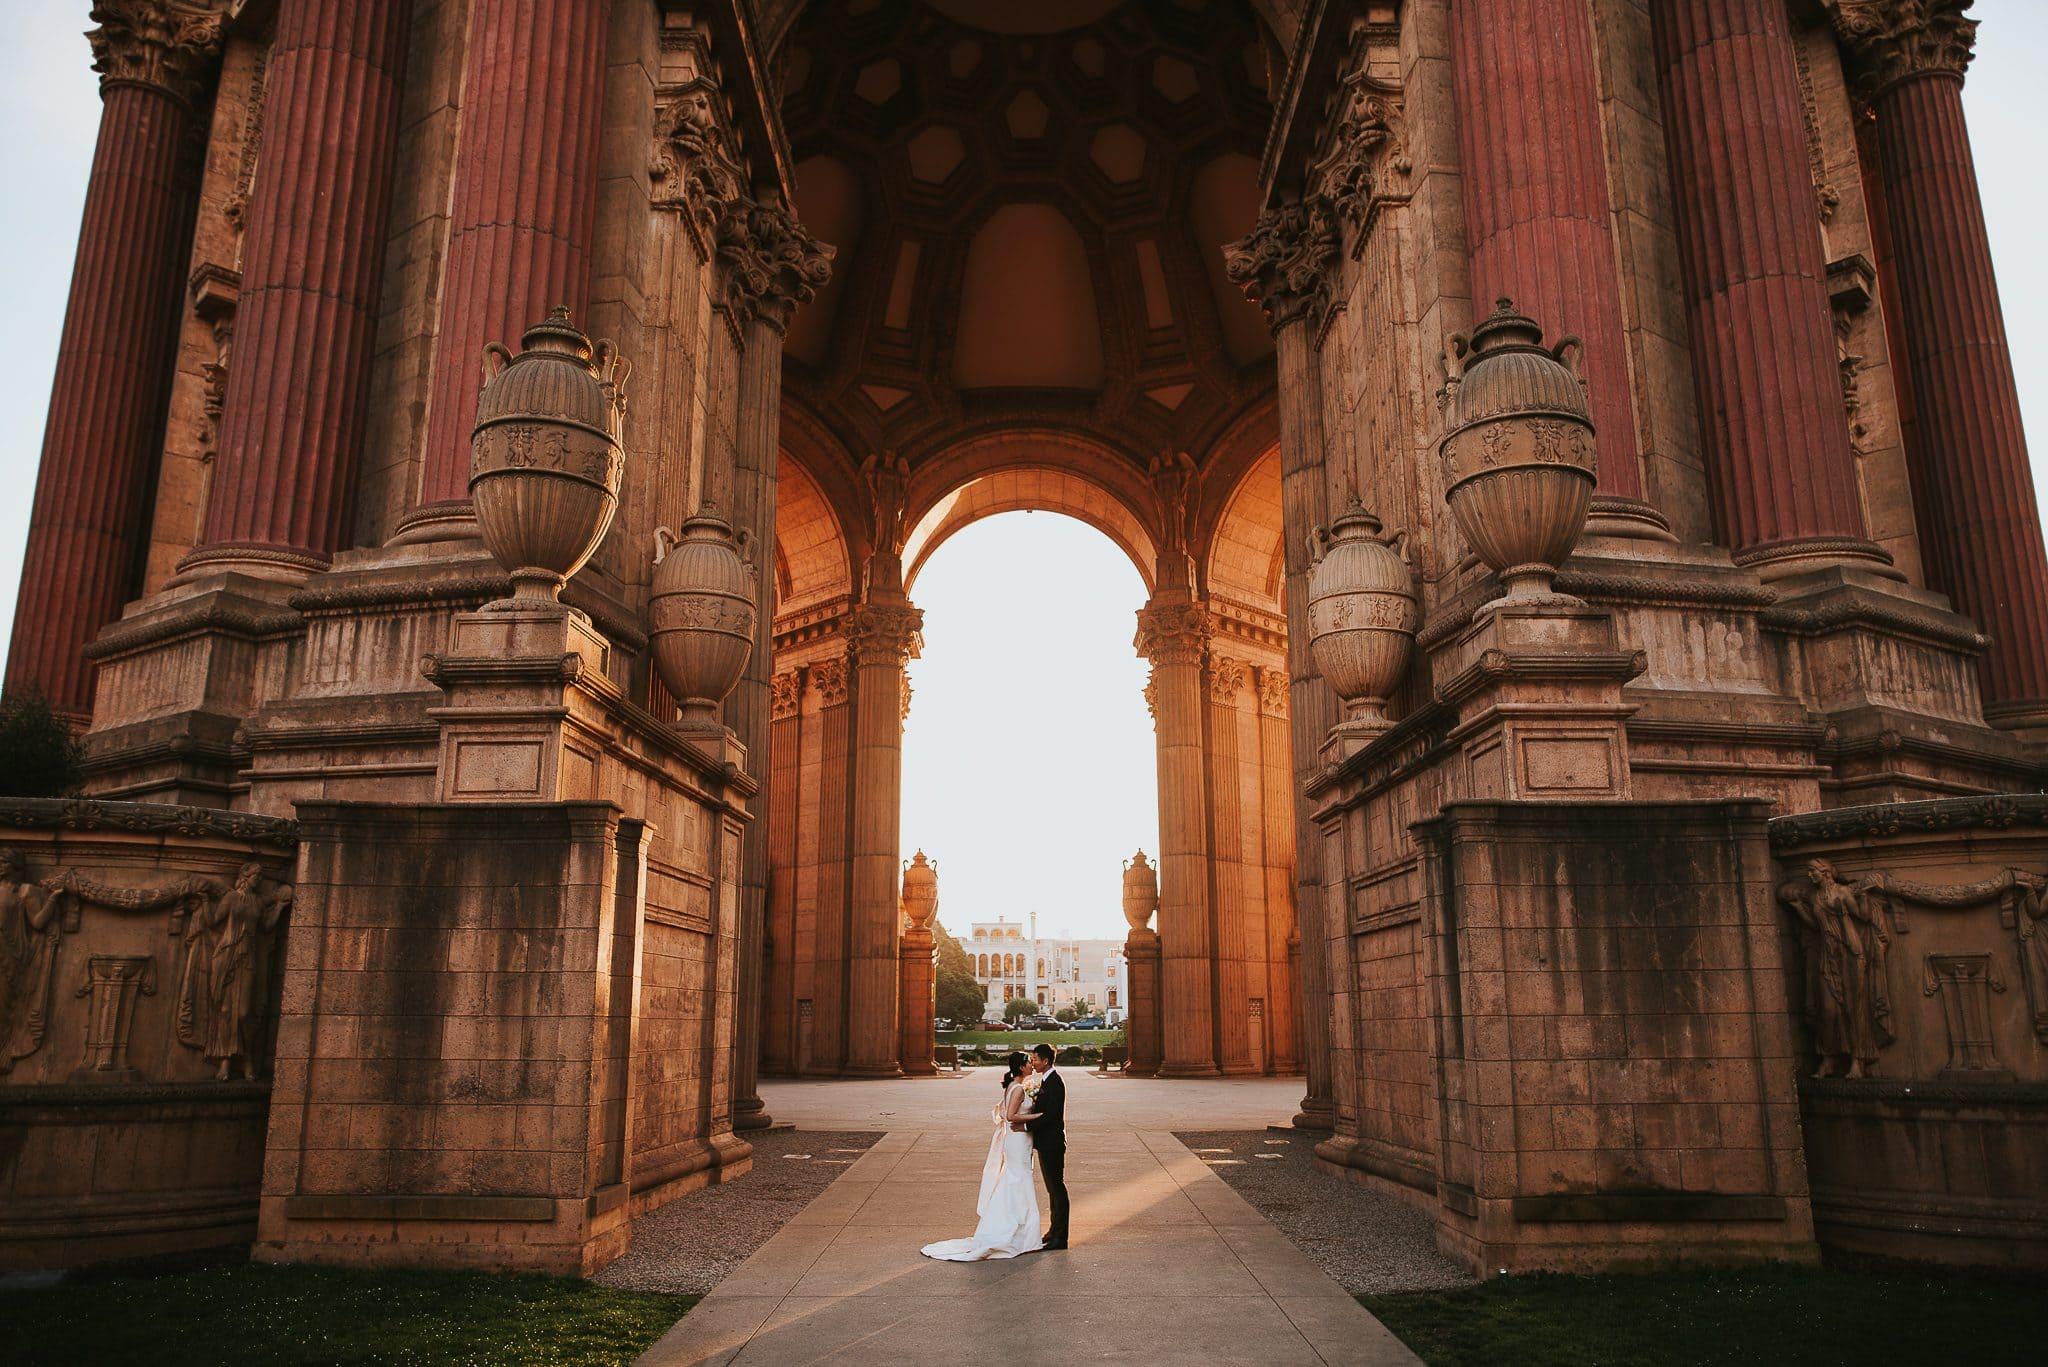 palace of fine arts san francisco sunrise